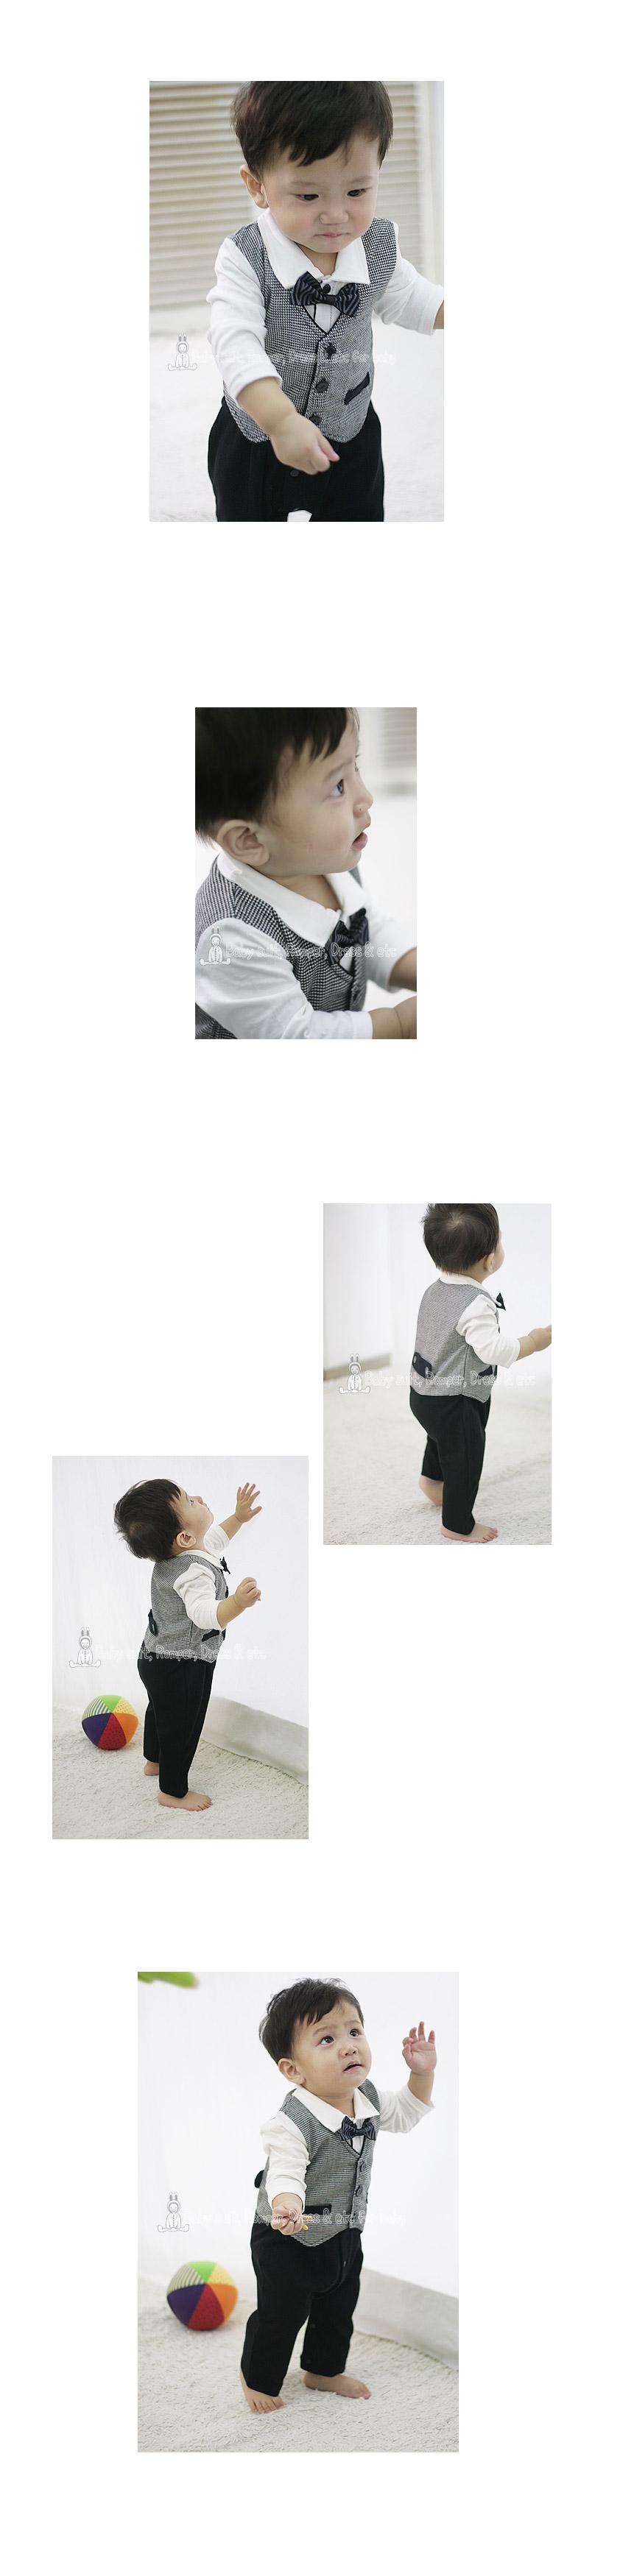 [ BABYMAX ] [] BABYMAX Botai 1205 最佳 Romper